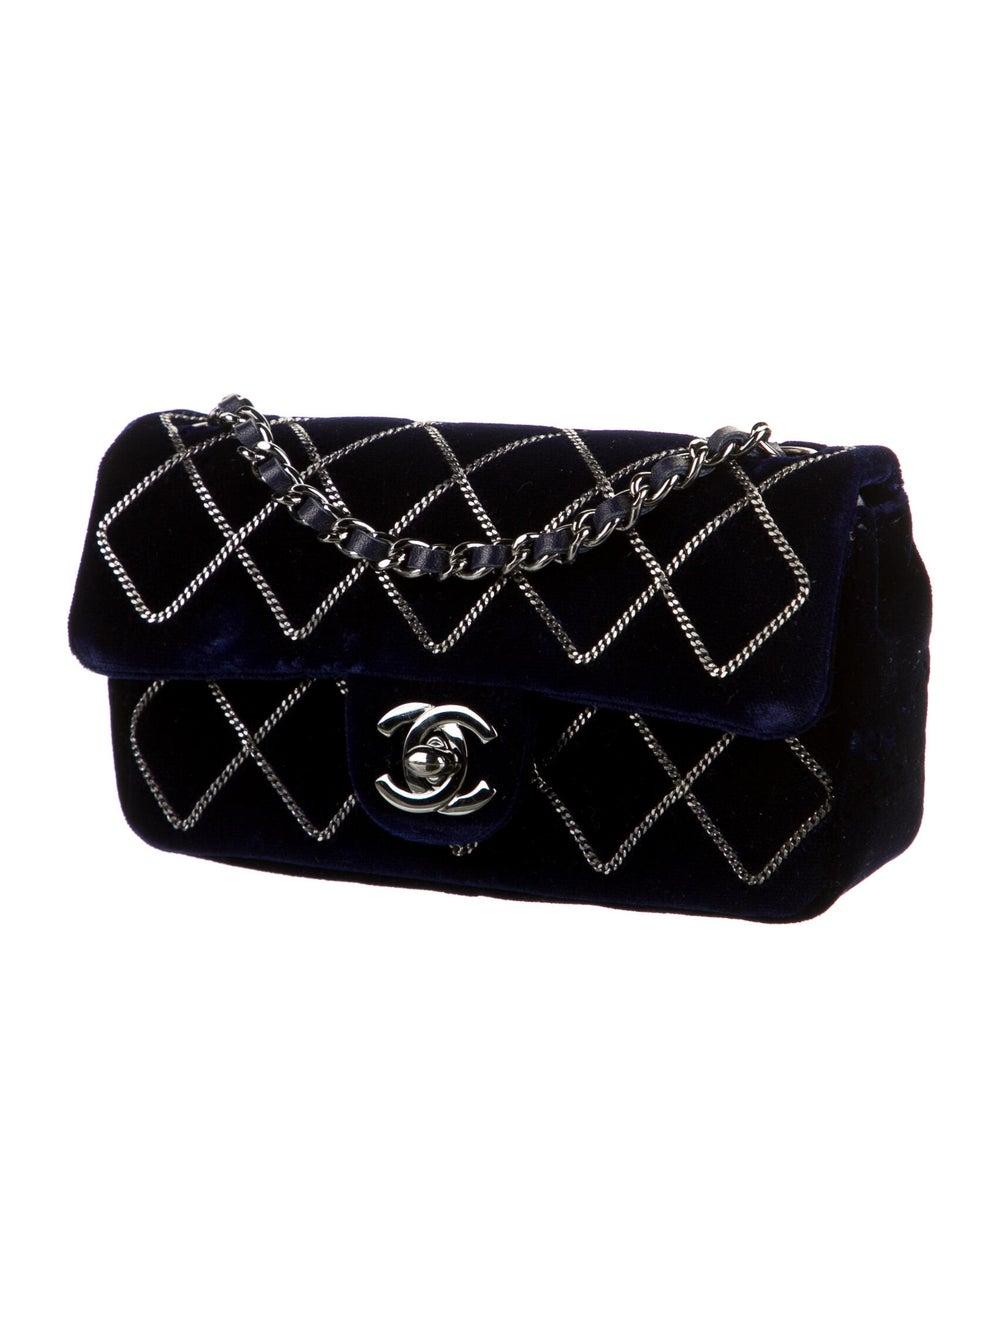 Chanel Chain Stitch Mini Velvet Flap Bag Blue - image 3